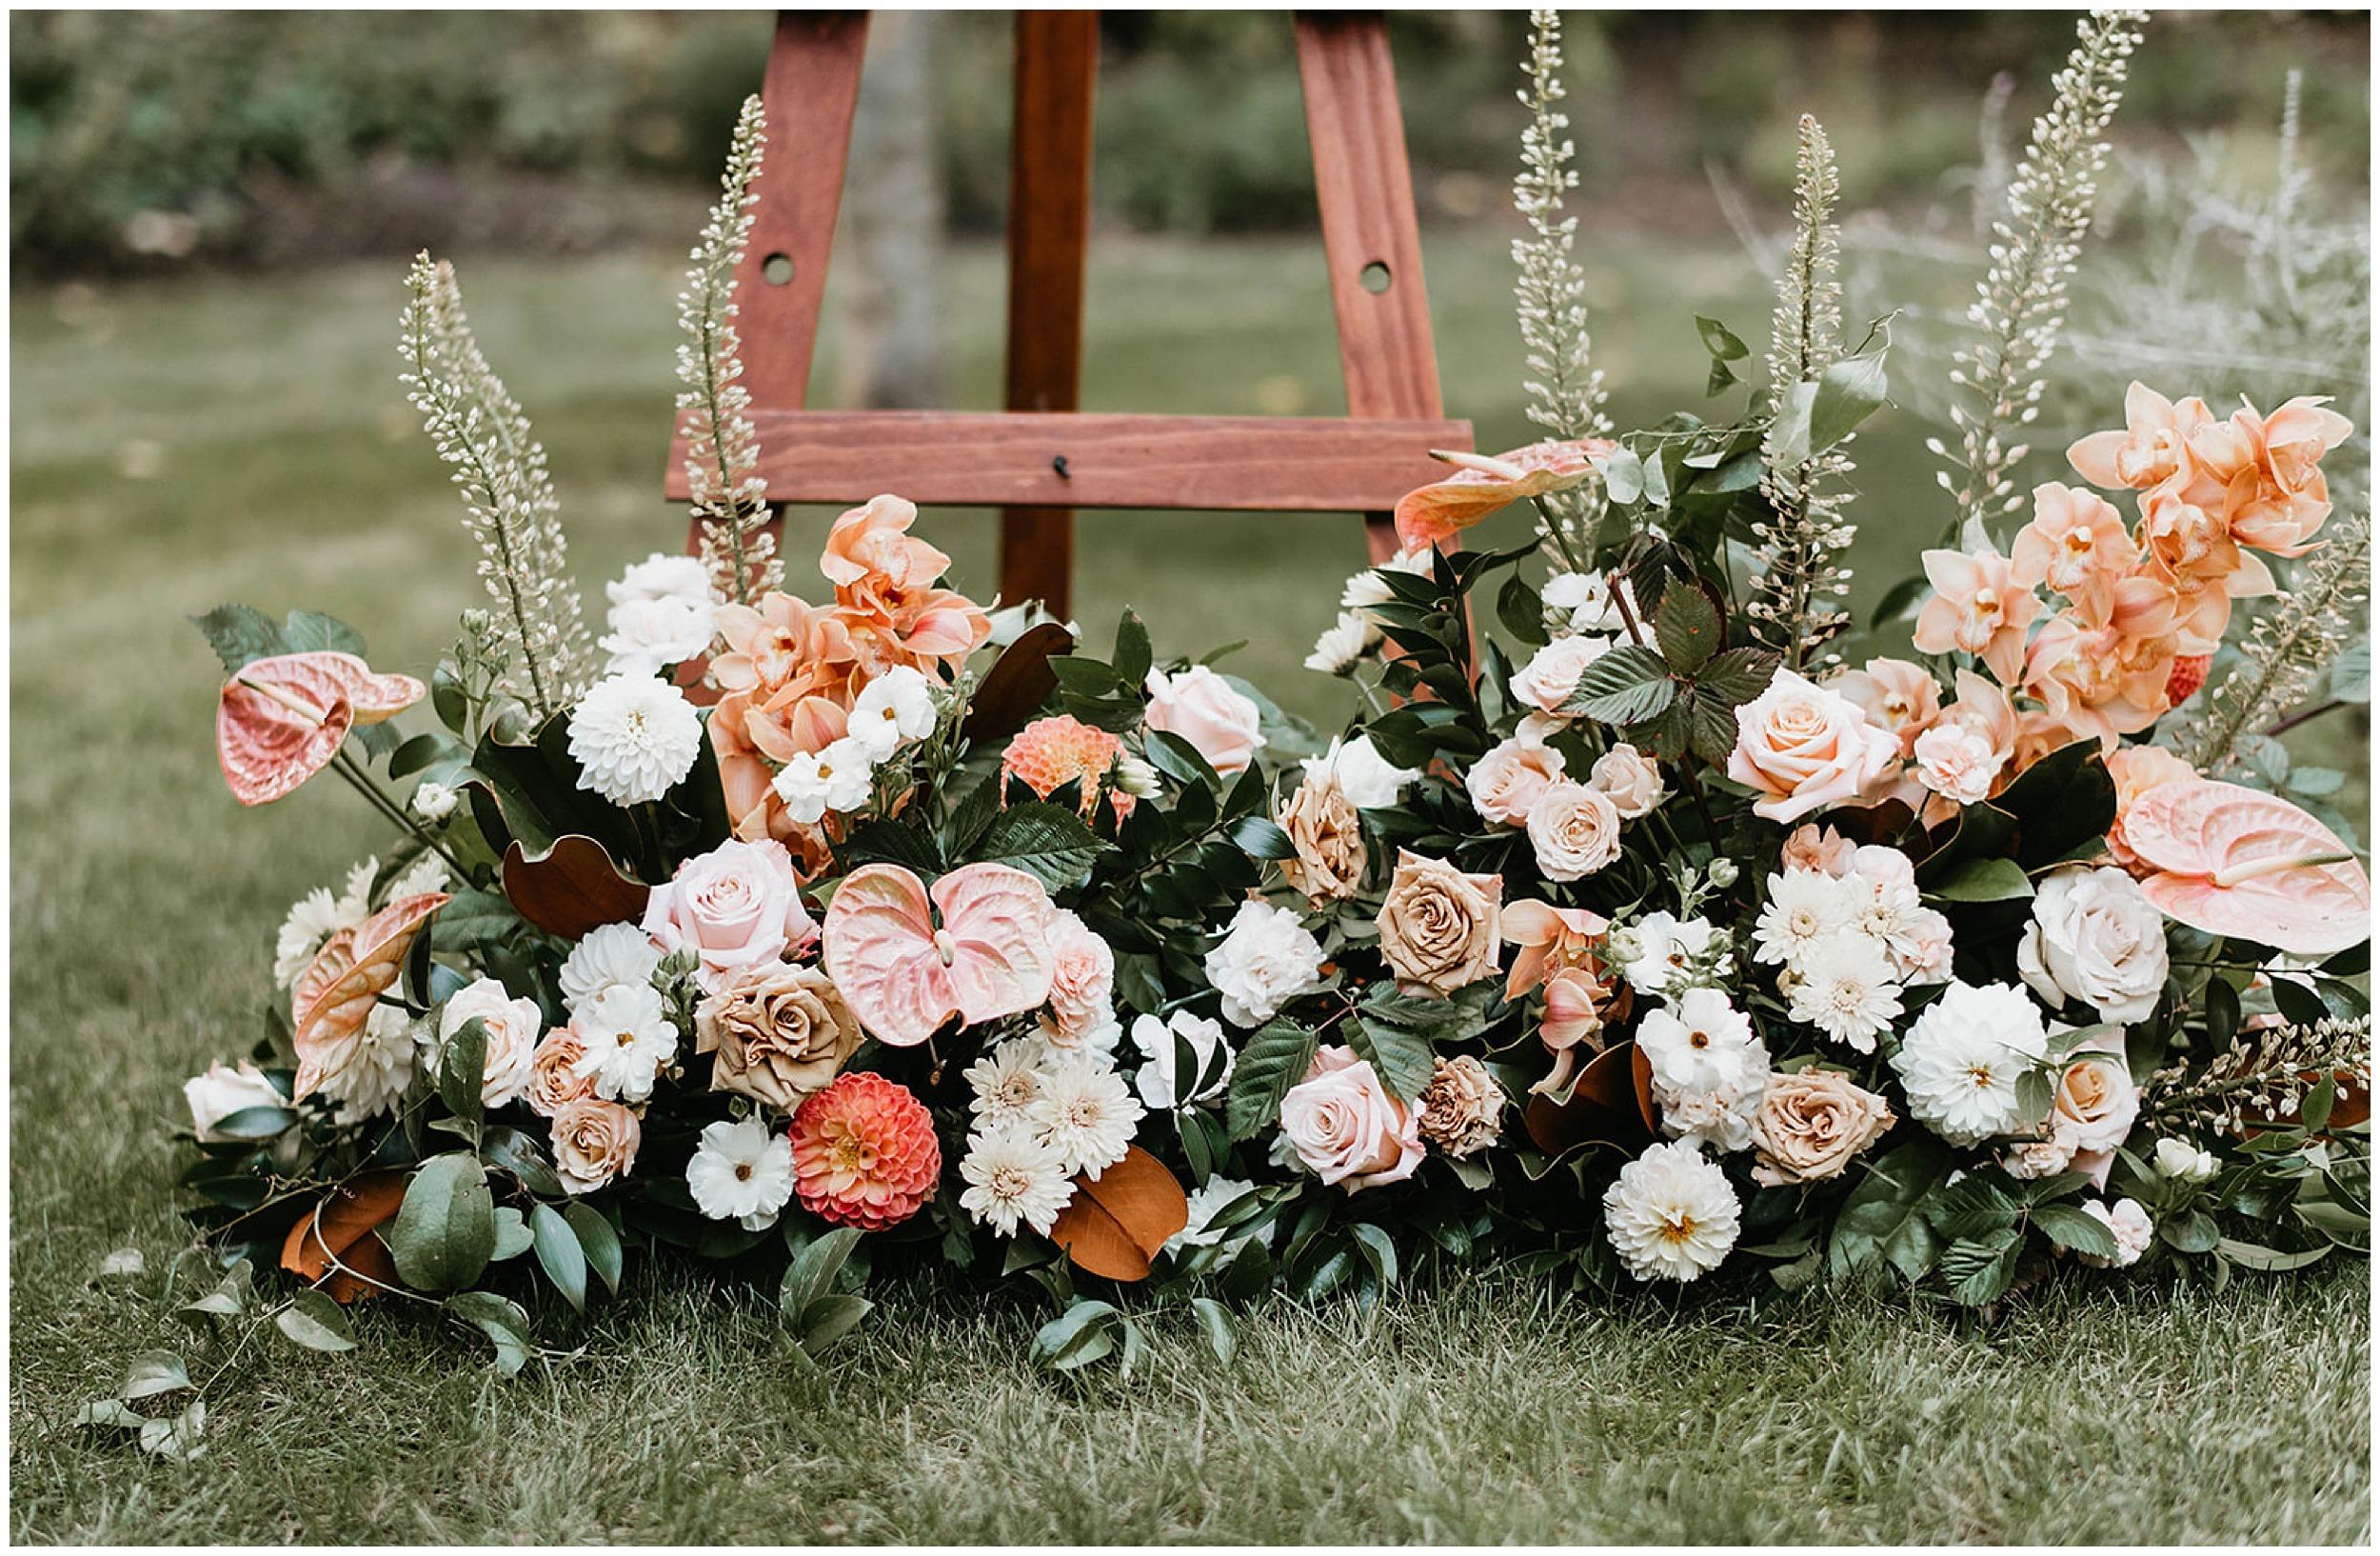 warm wedding flowers